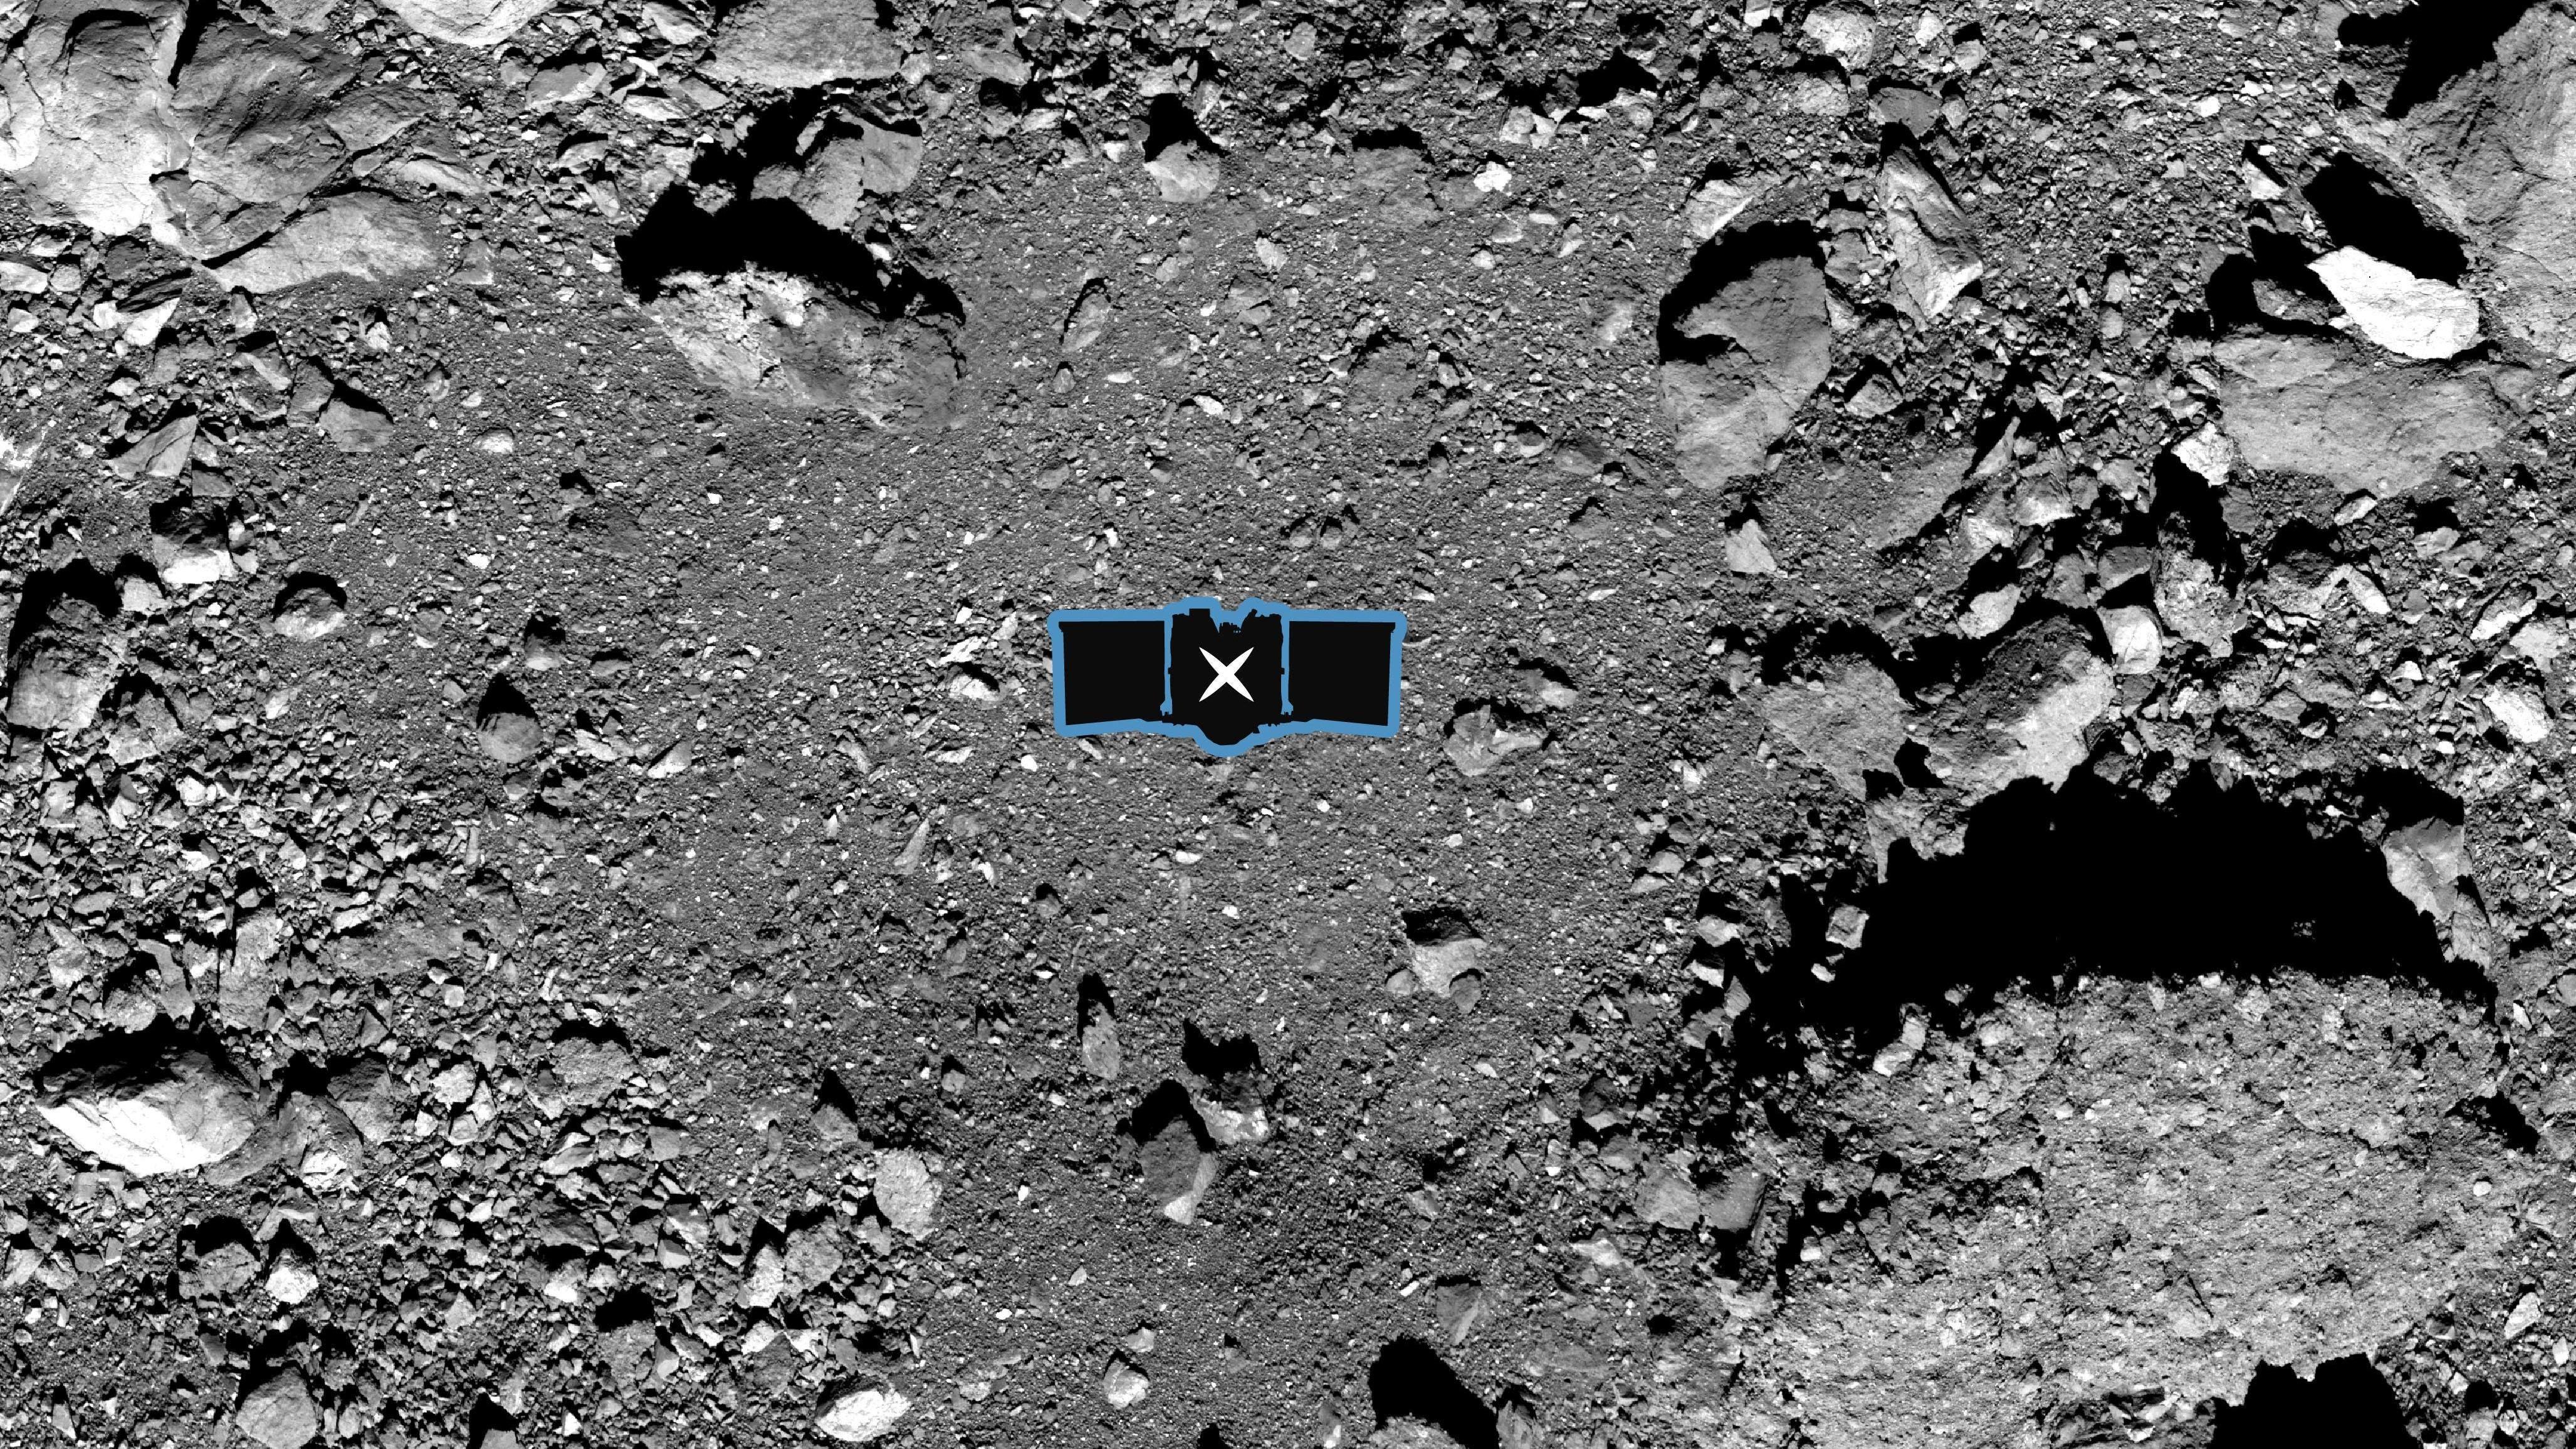 OSIRIS-REx Team Will Boop This Spot On Asteroid Bennu